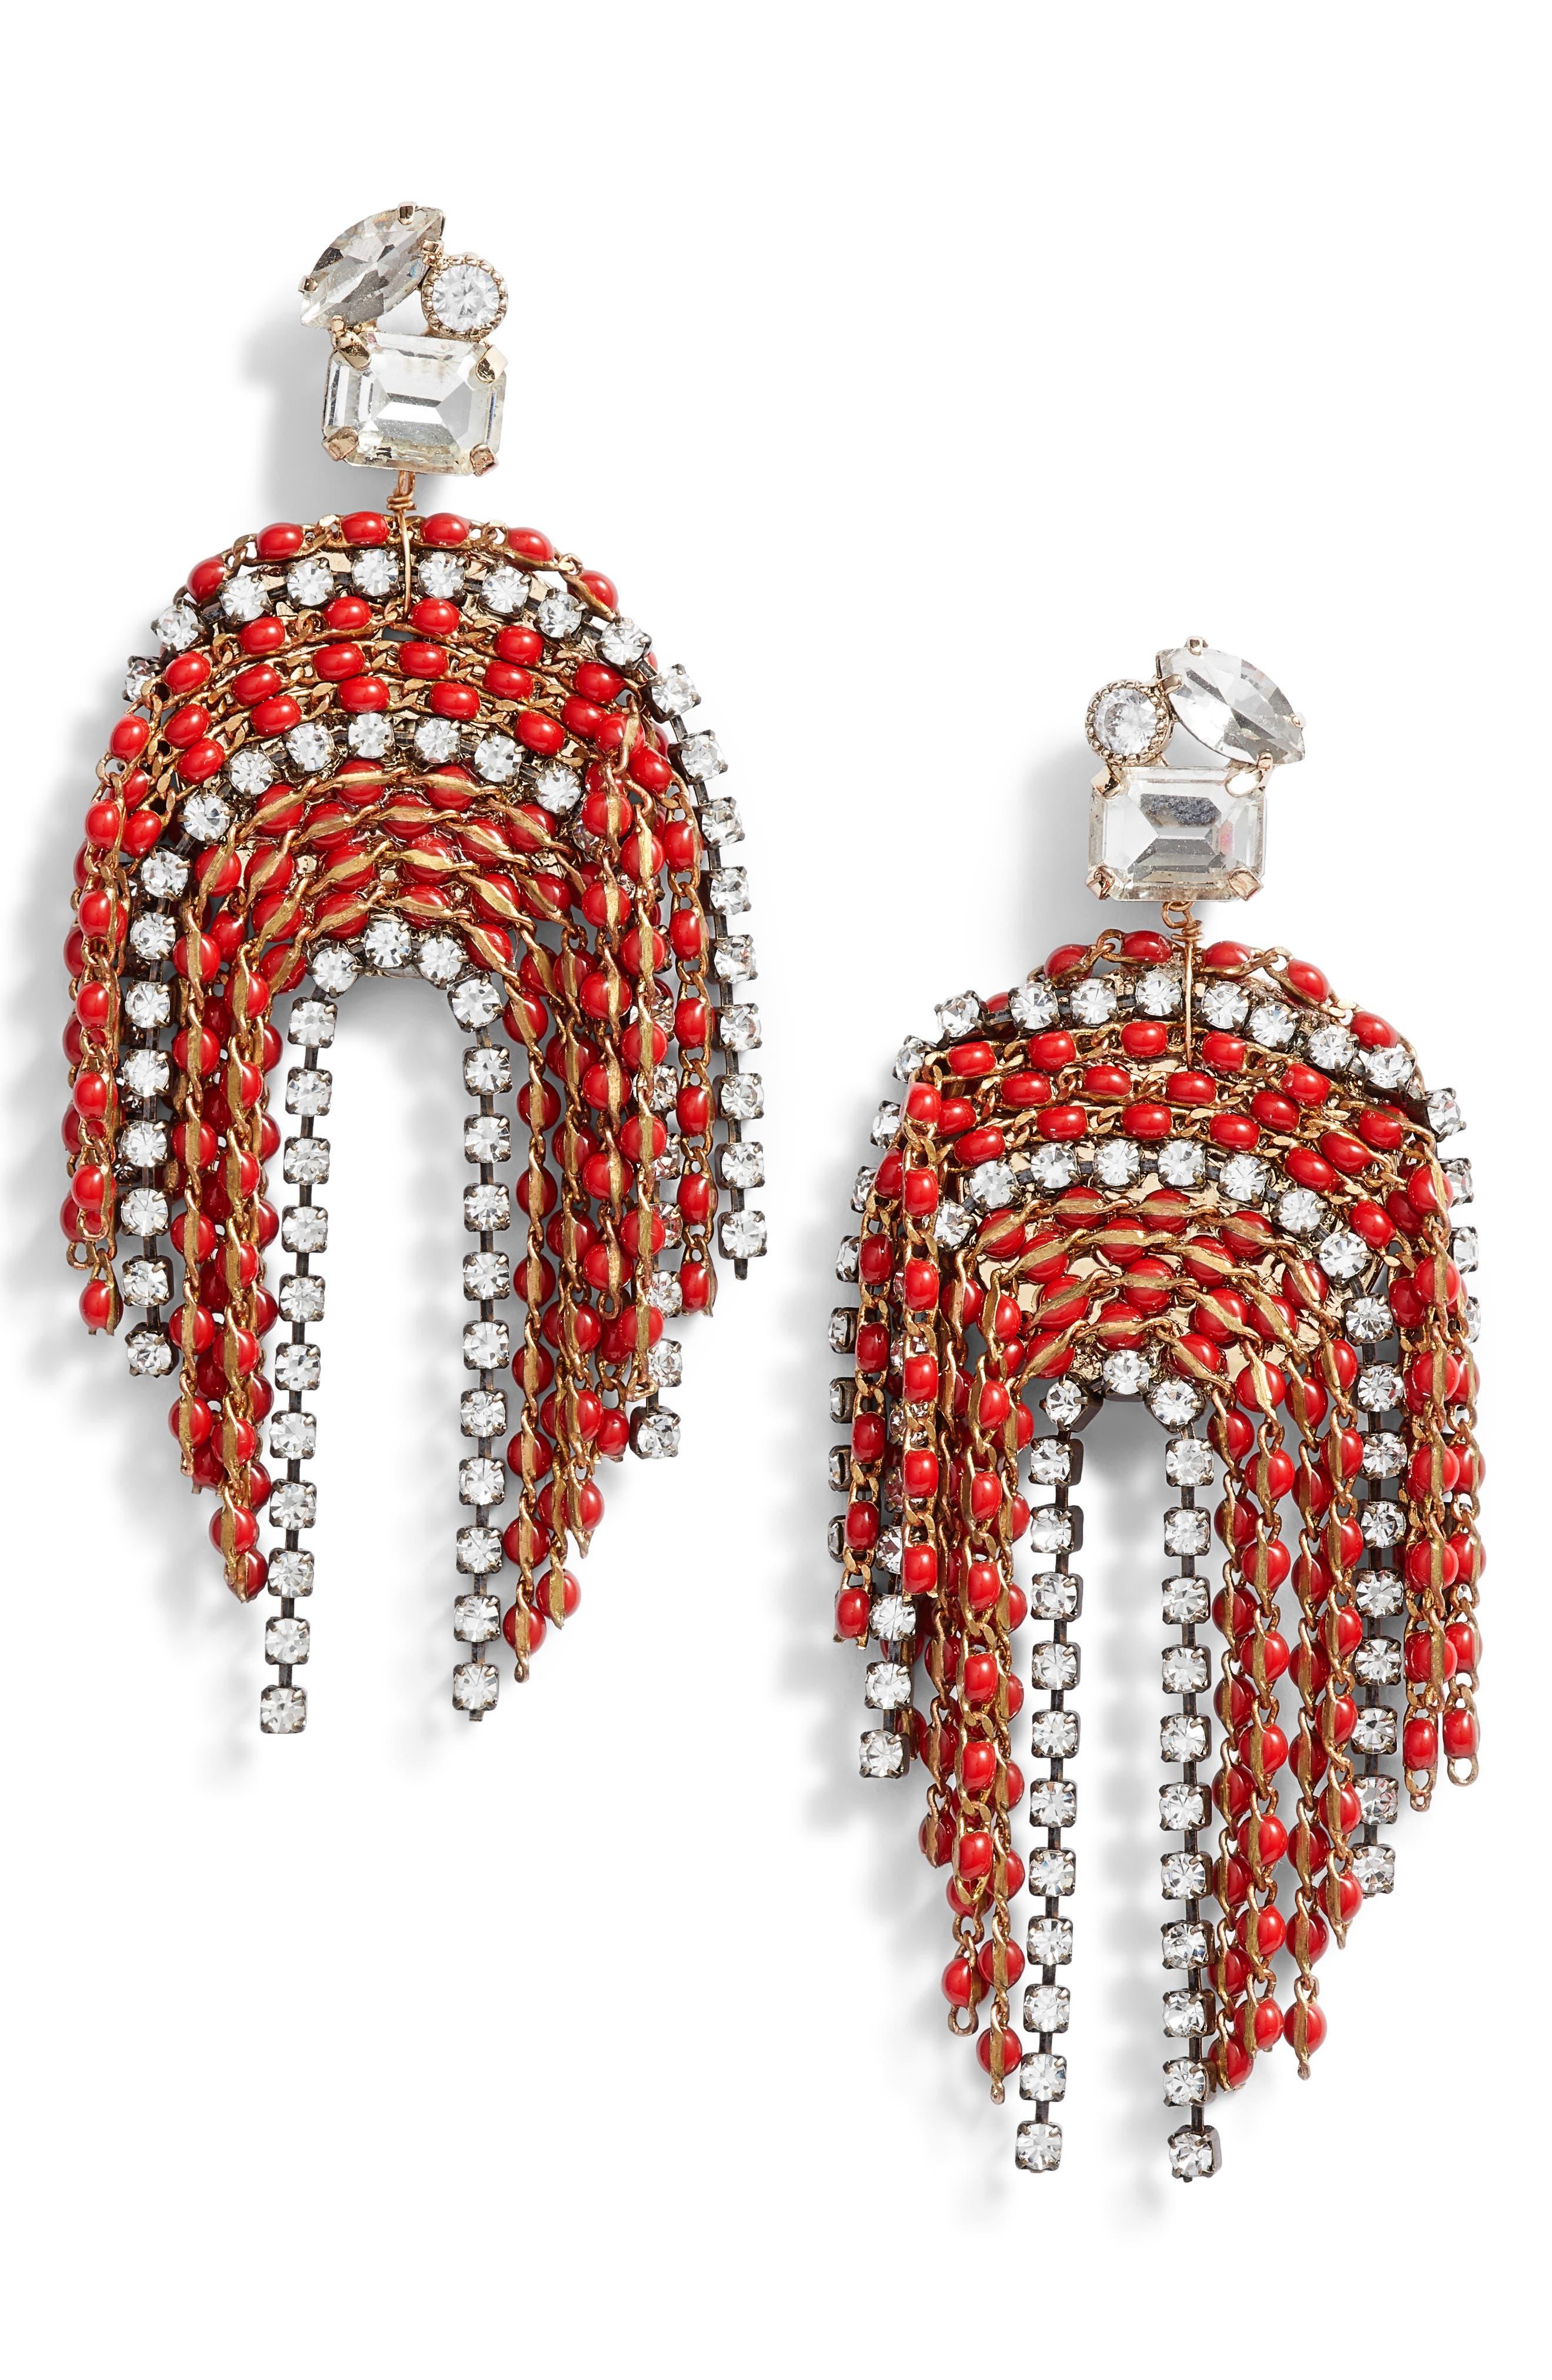 SEREFINA Fringe Statement Earrings in Burgundy